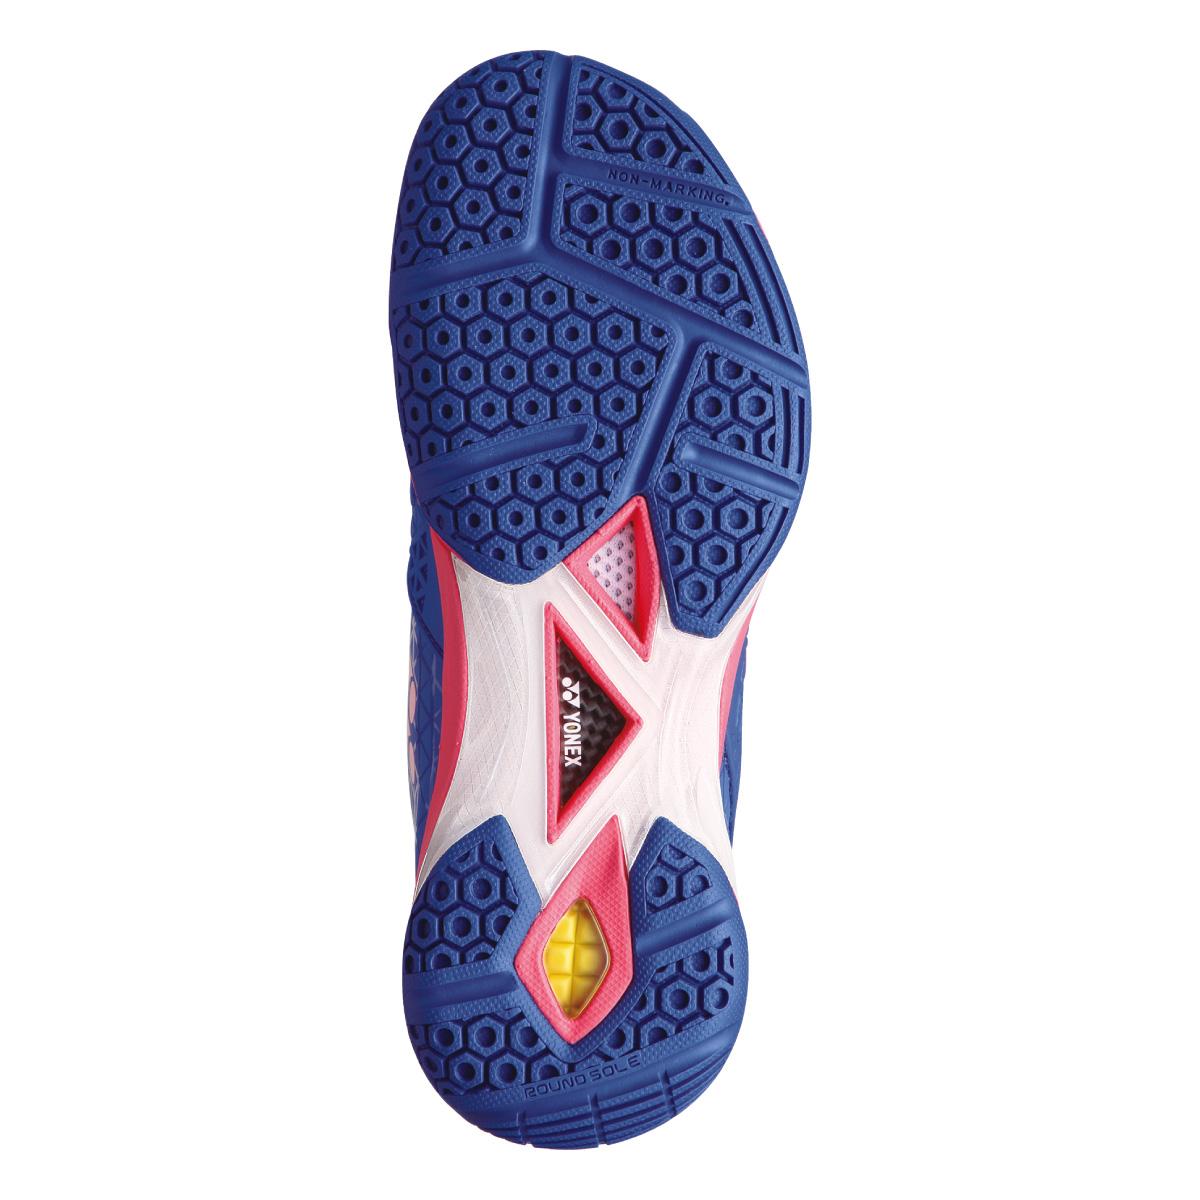 Badmintonschuh - YONEX - PC-ECLIPSION Z WOMENDetailbild - 0